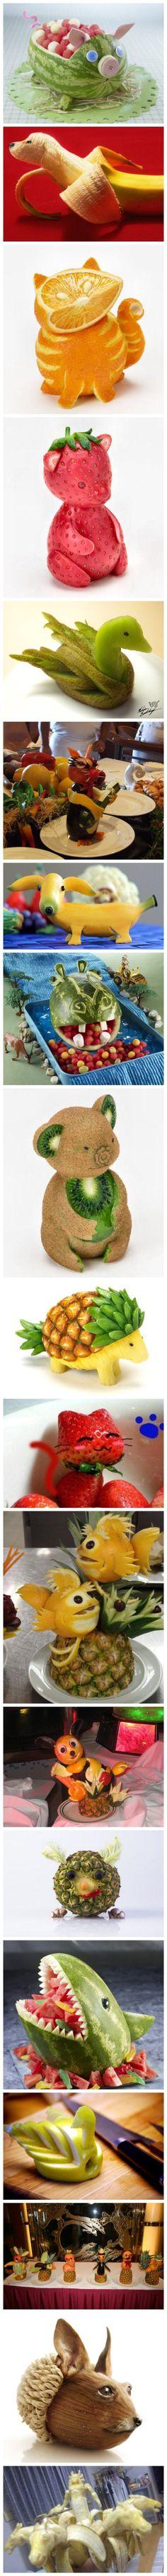 Fruit Carving Fun - When Creativity Meets Fruits | DIY Tag